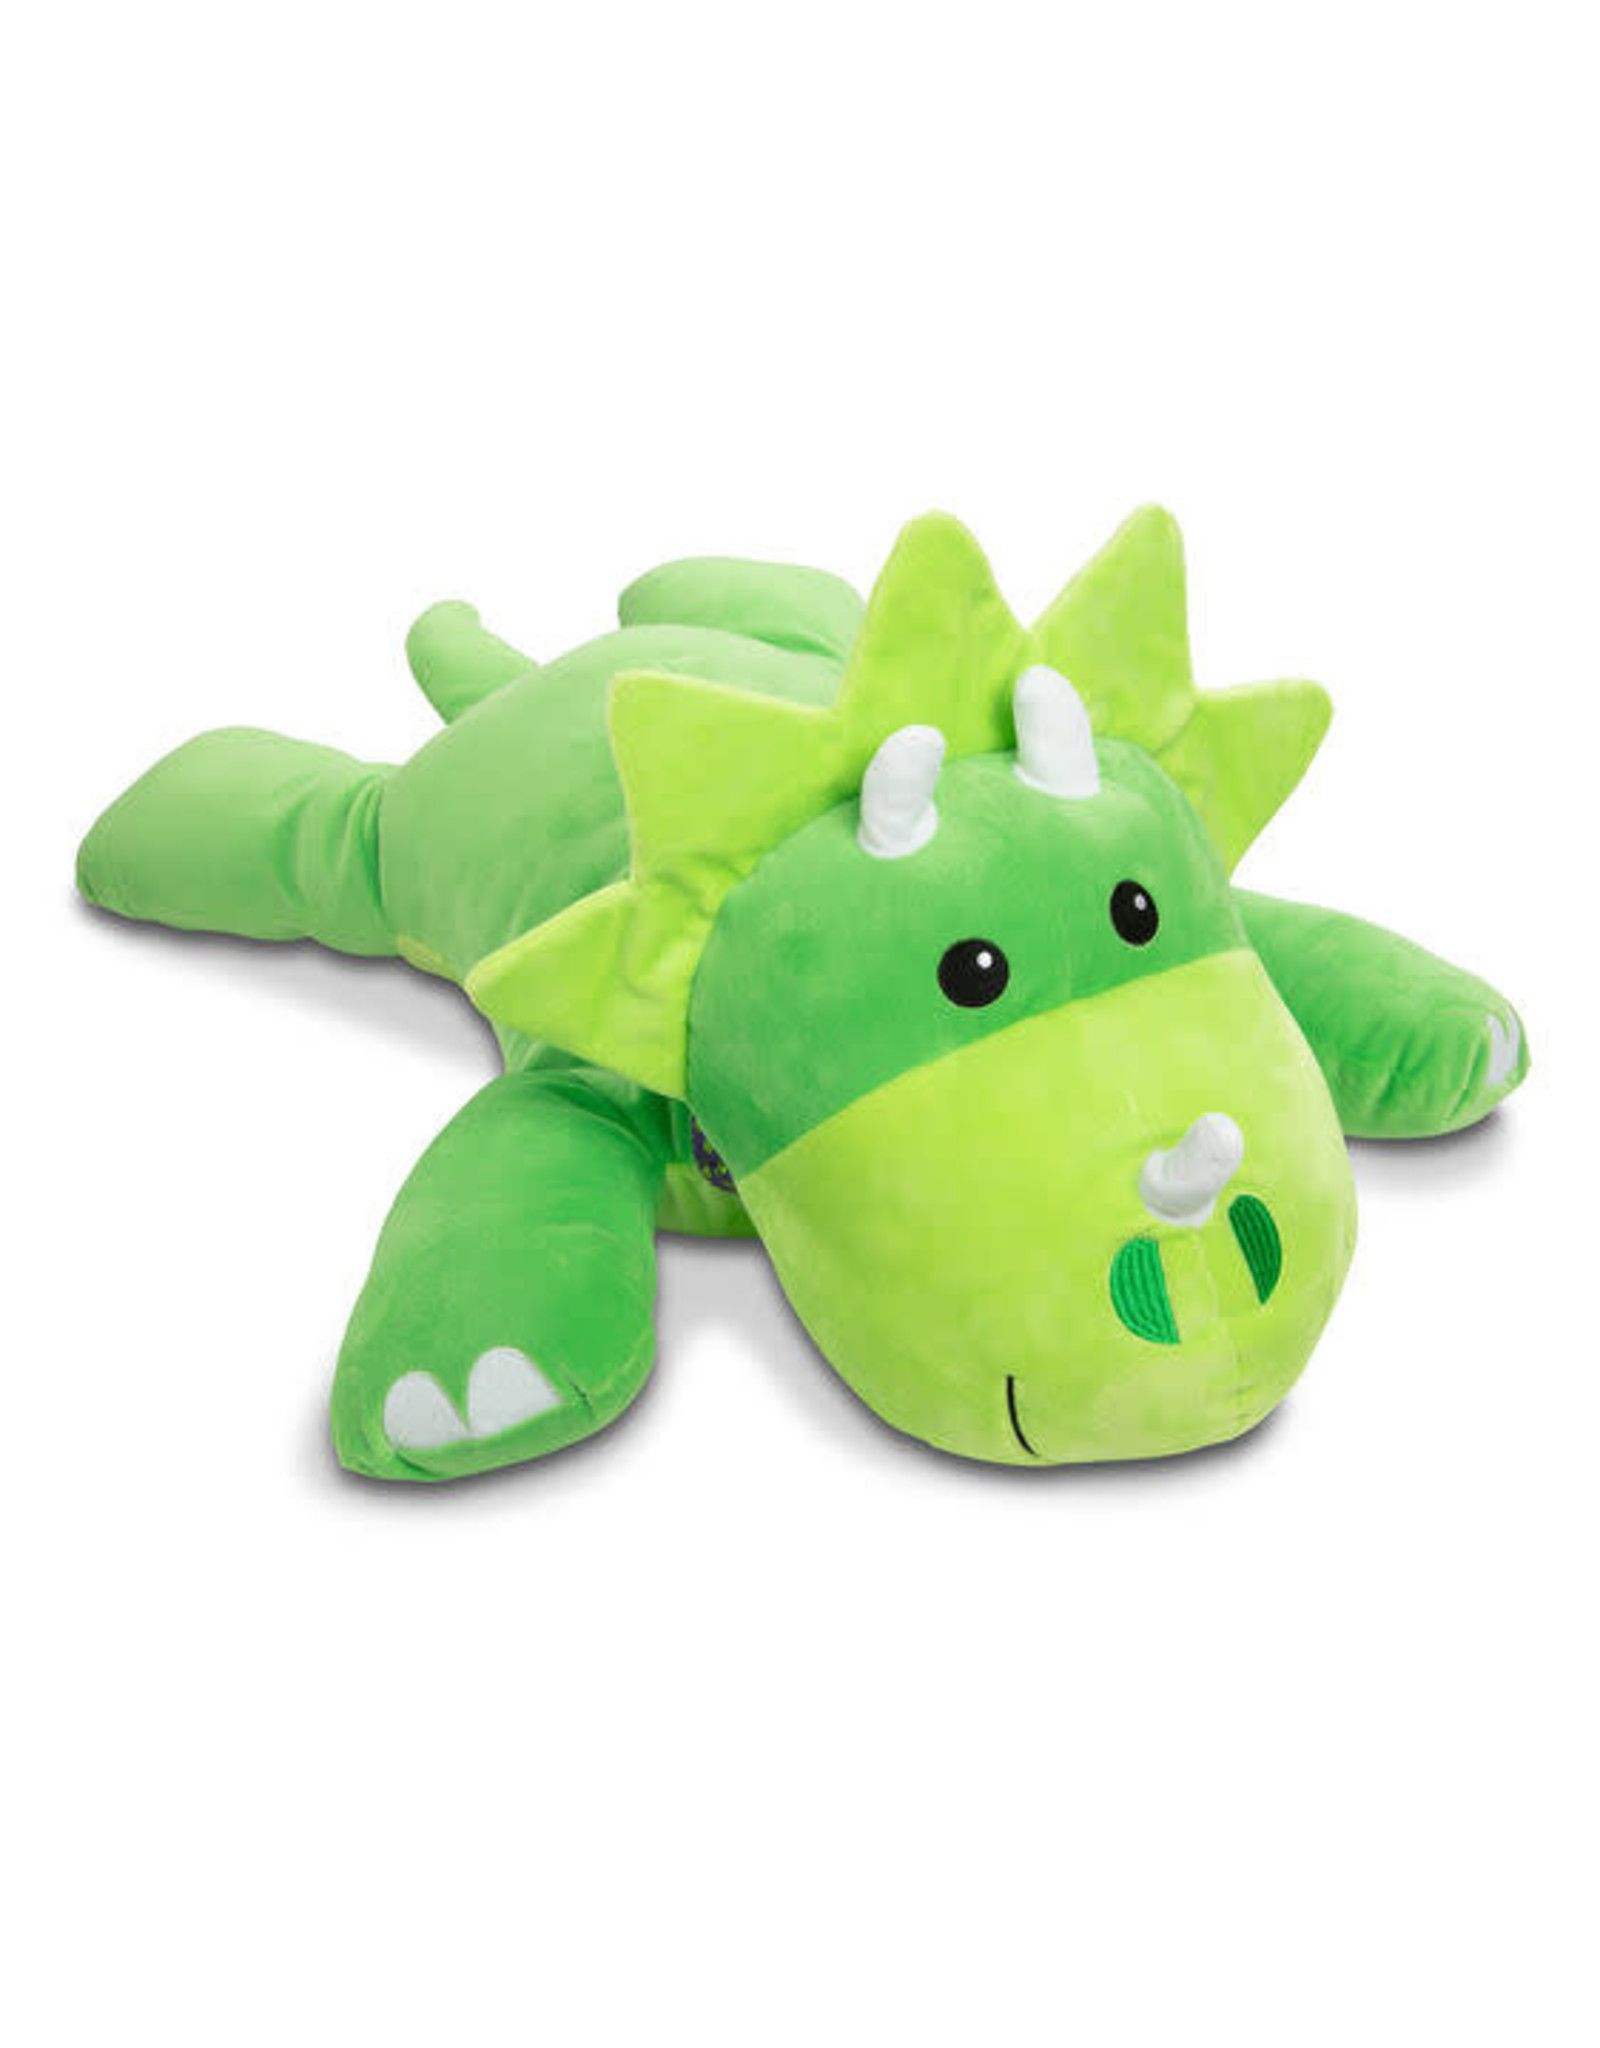 Cuddle Dinosaur